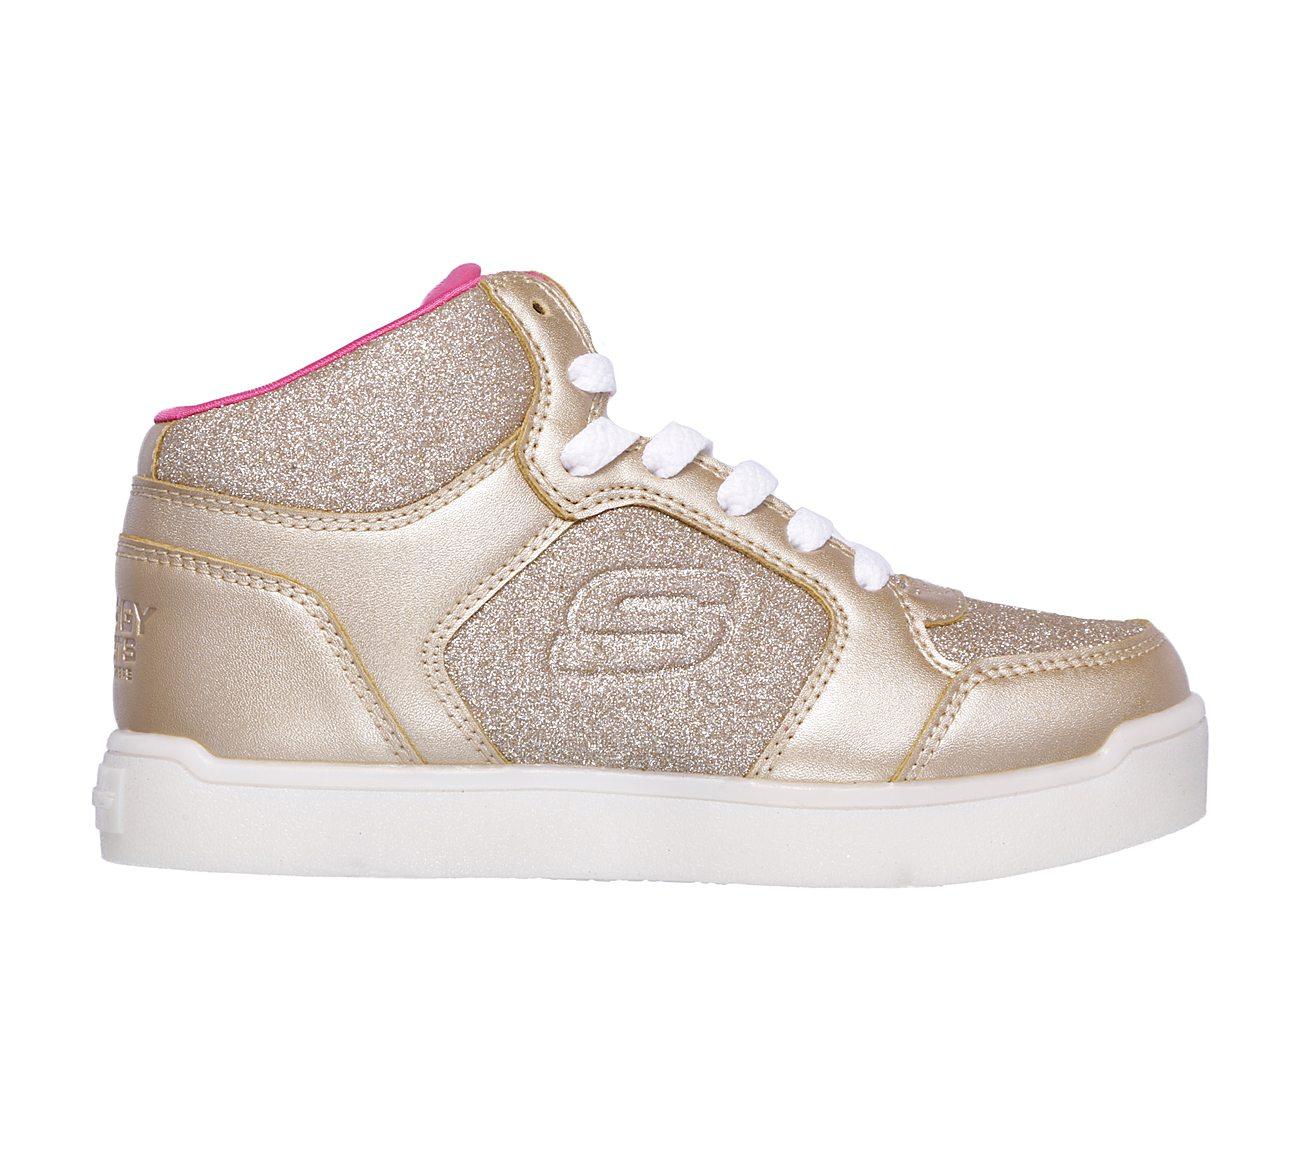 b0635a86 Buy SKECHERS Energy Lights: E-Pro Glitter Glow Energy Lights Shoes only  $38.50